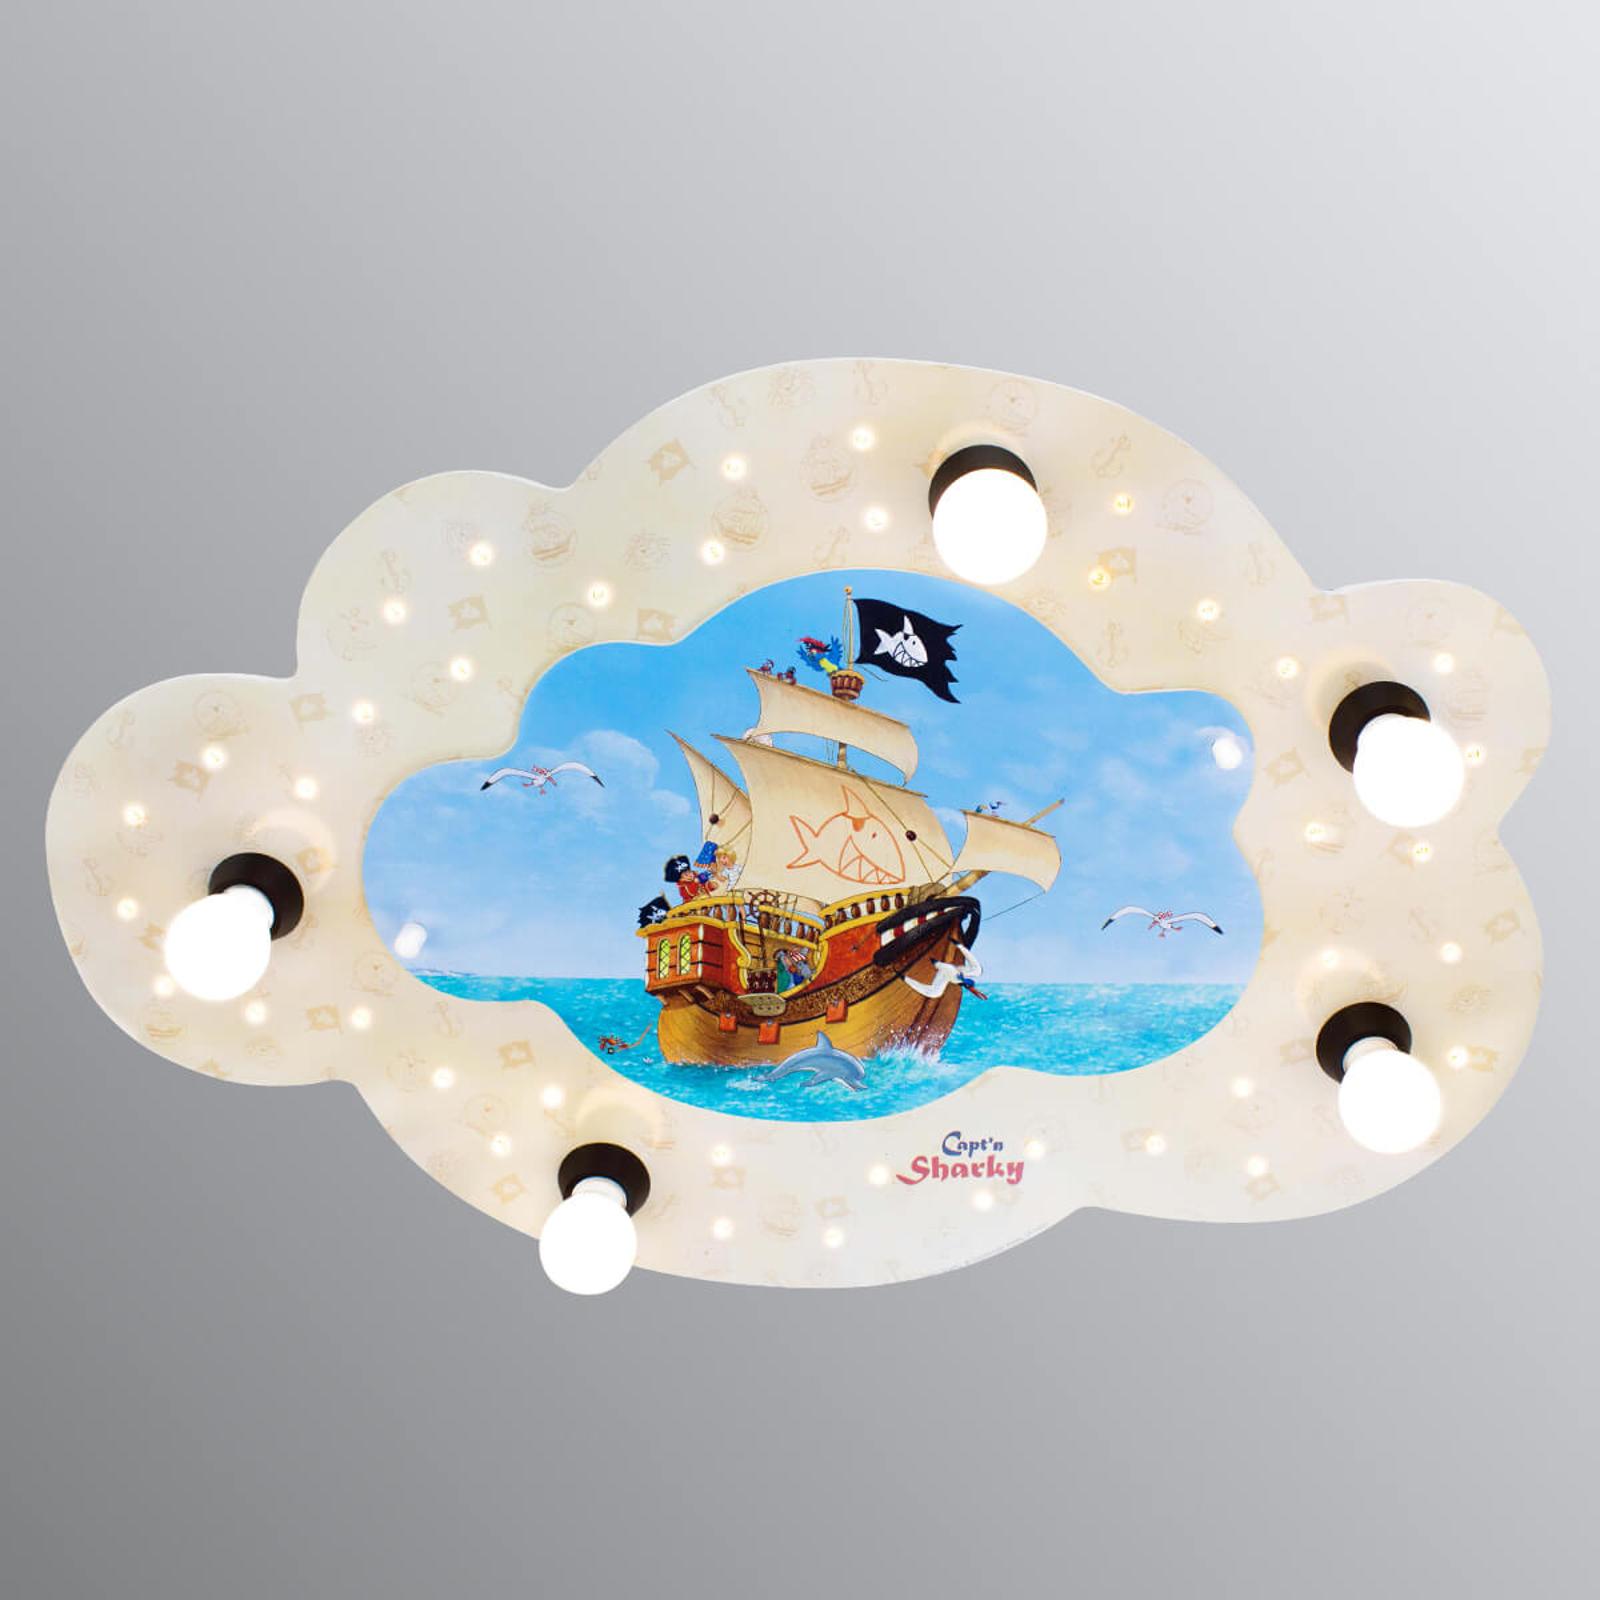 Skyformet Capt'n Sharky loftlampe med LED'er